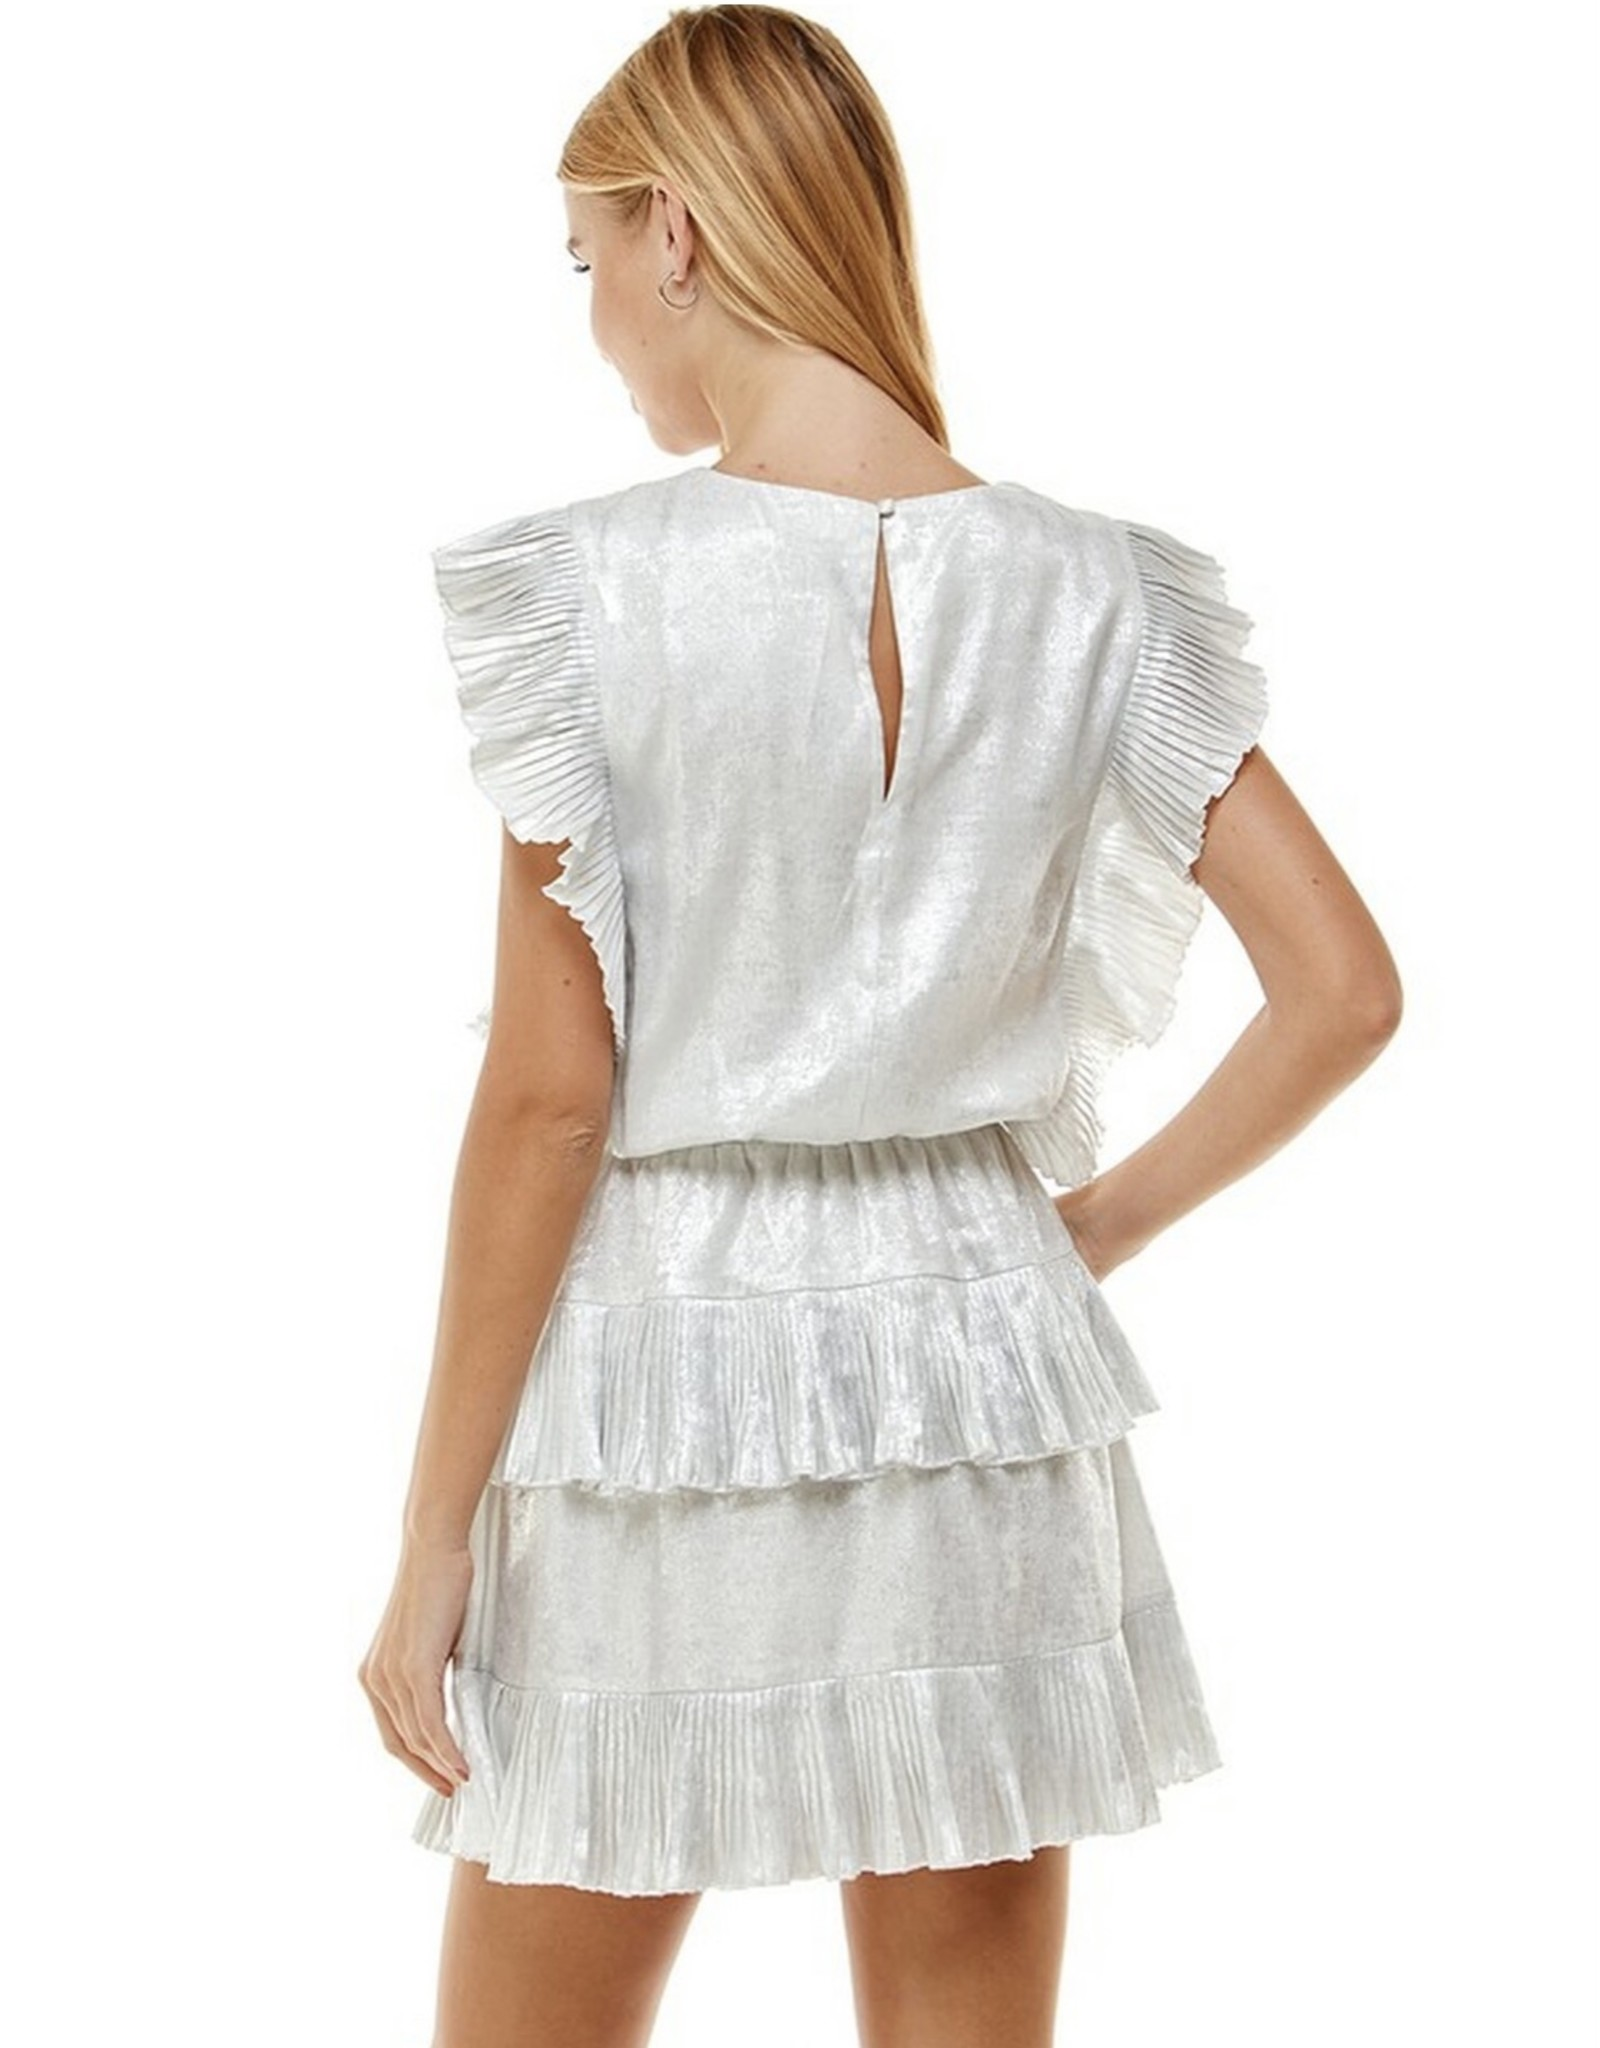 Silver Ruffle Dress